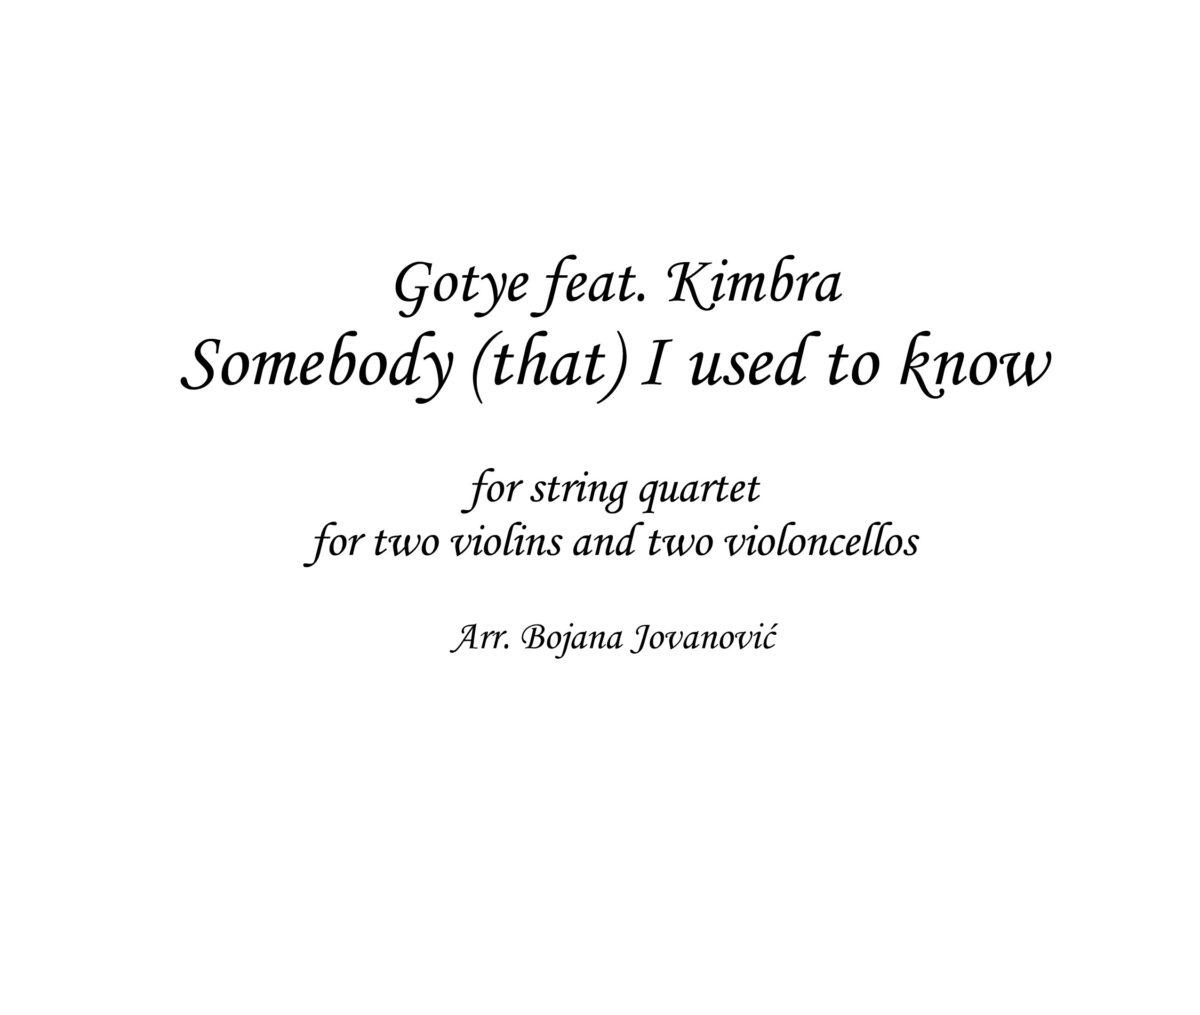 Somebody I used to know (Gotye ft Kimbra) - Sheet Music